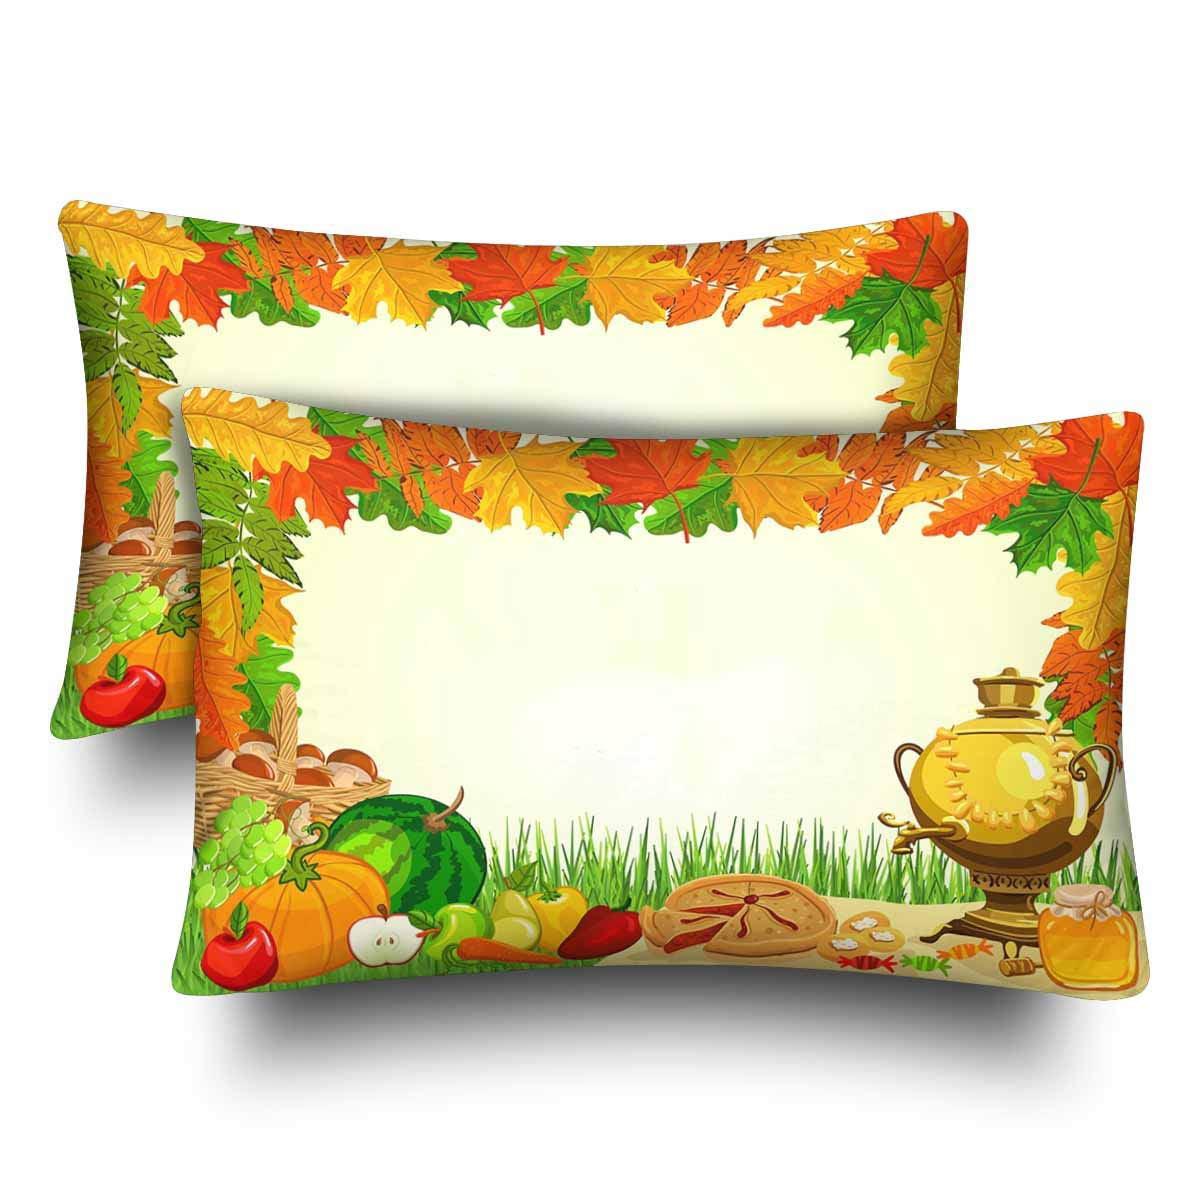 GCKG Autumn Picnic Watermelon Pumpkin Pizza Fall Harvest Pillow Cases Pillowcase 20x30 inches Set of 2 - image 4 of 4